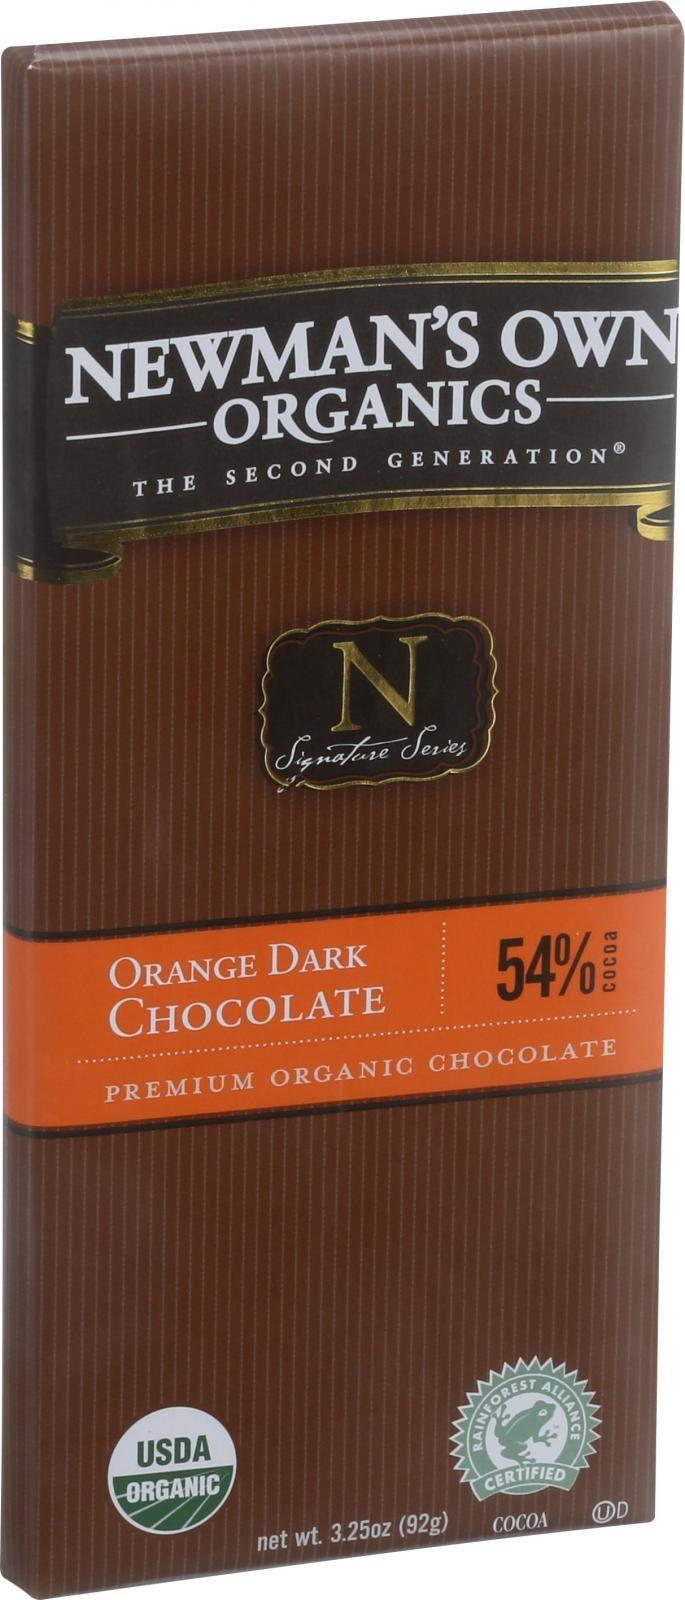 Newman's Own Organics Chocolate Bar - Organic - Dark Chocolate - Orange - 3.25 oz Bars - Case of 12